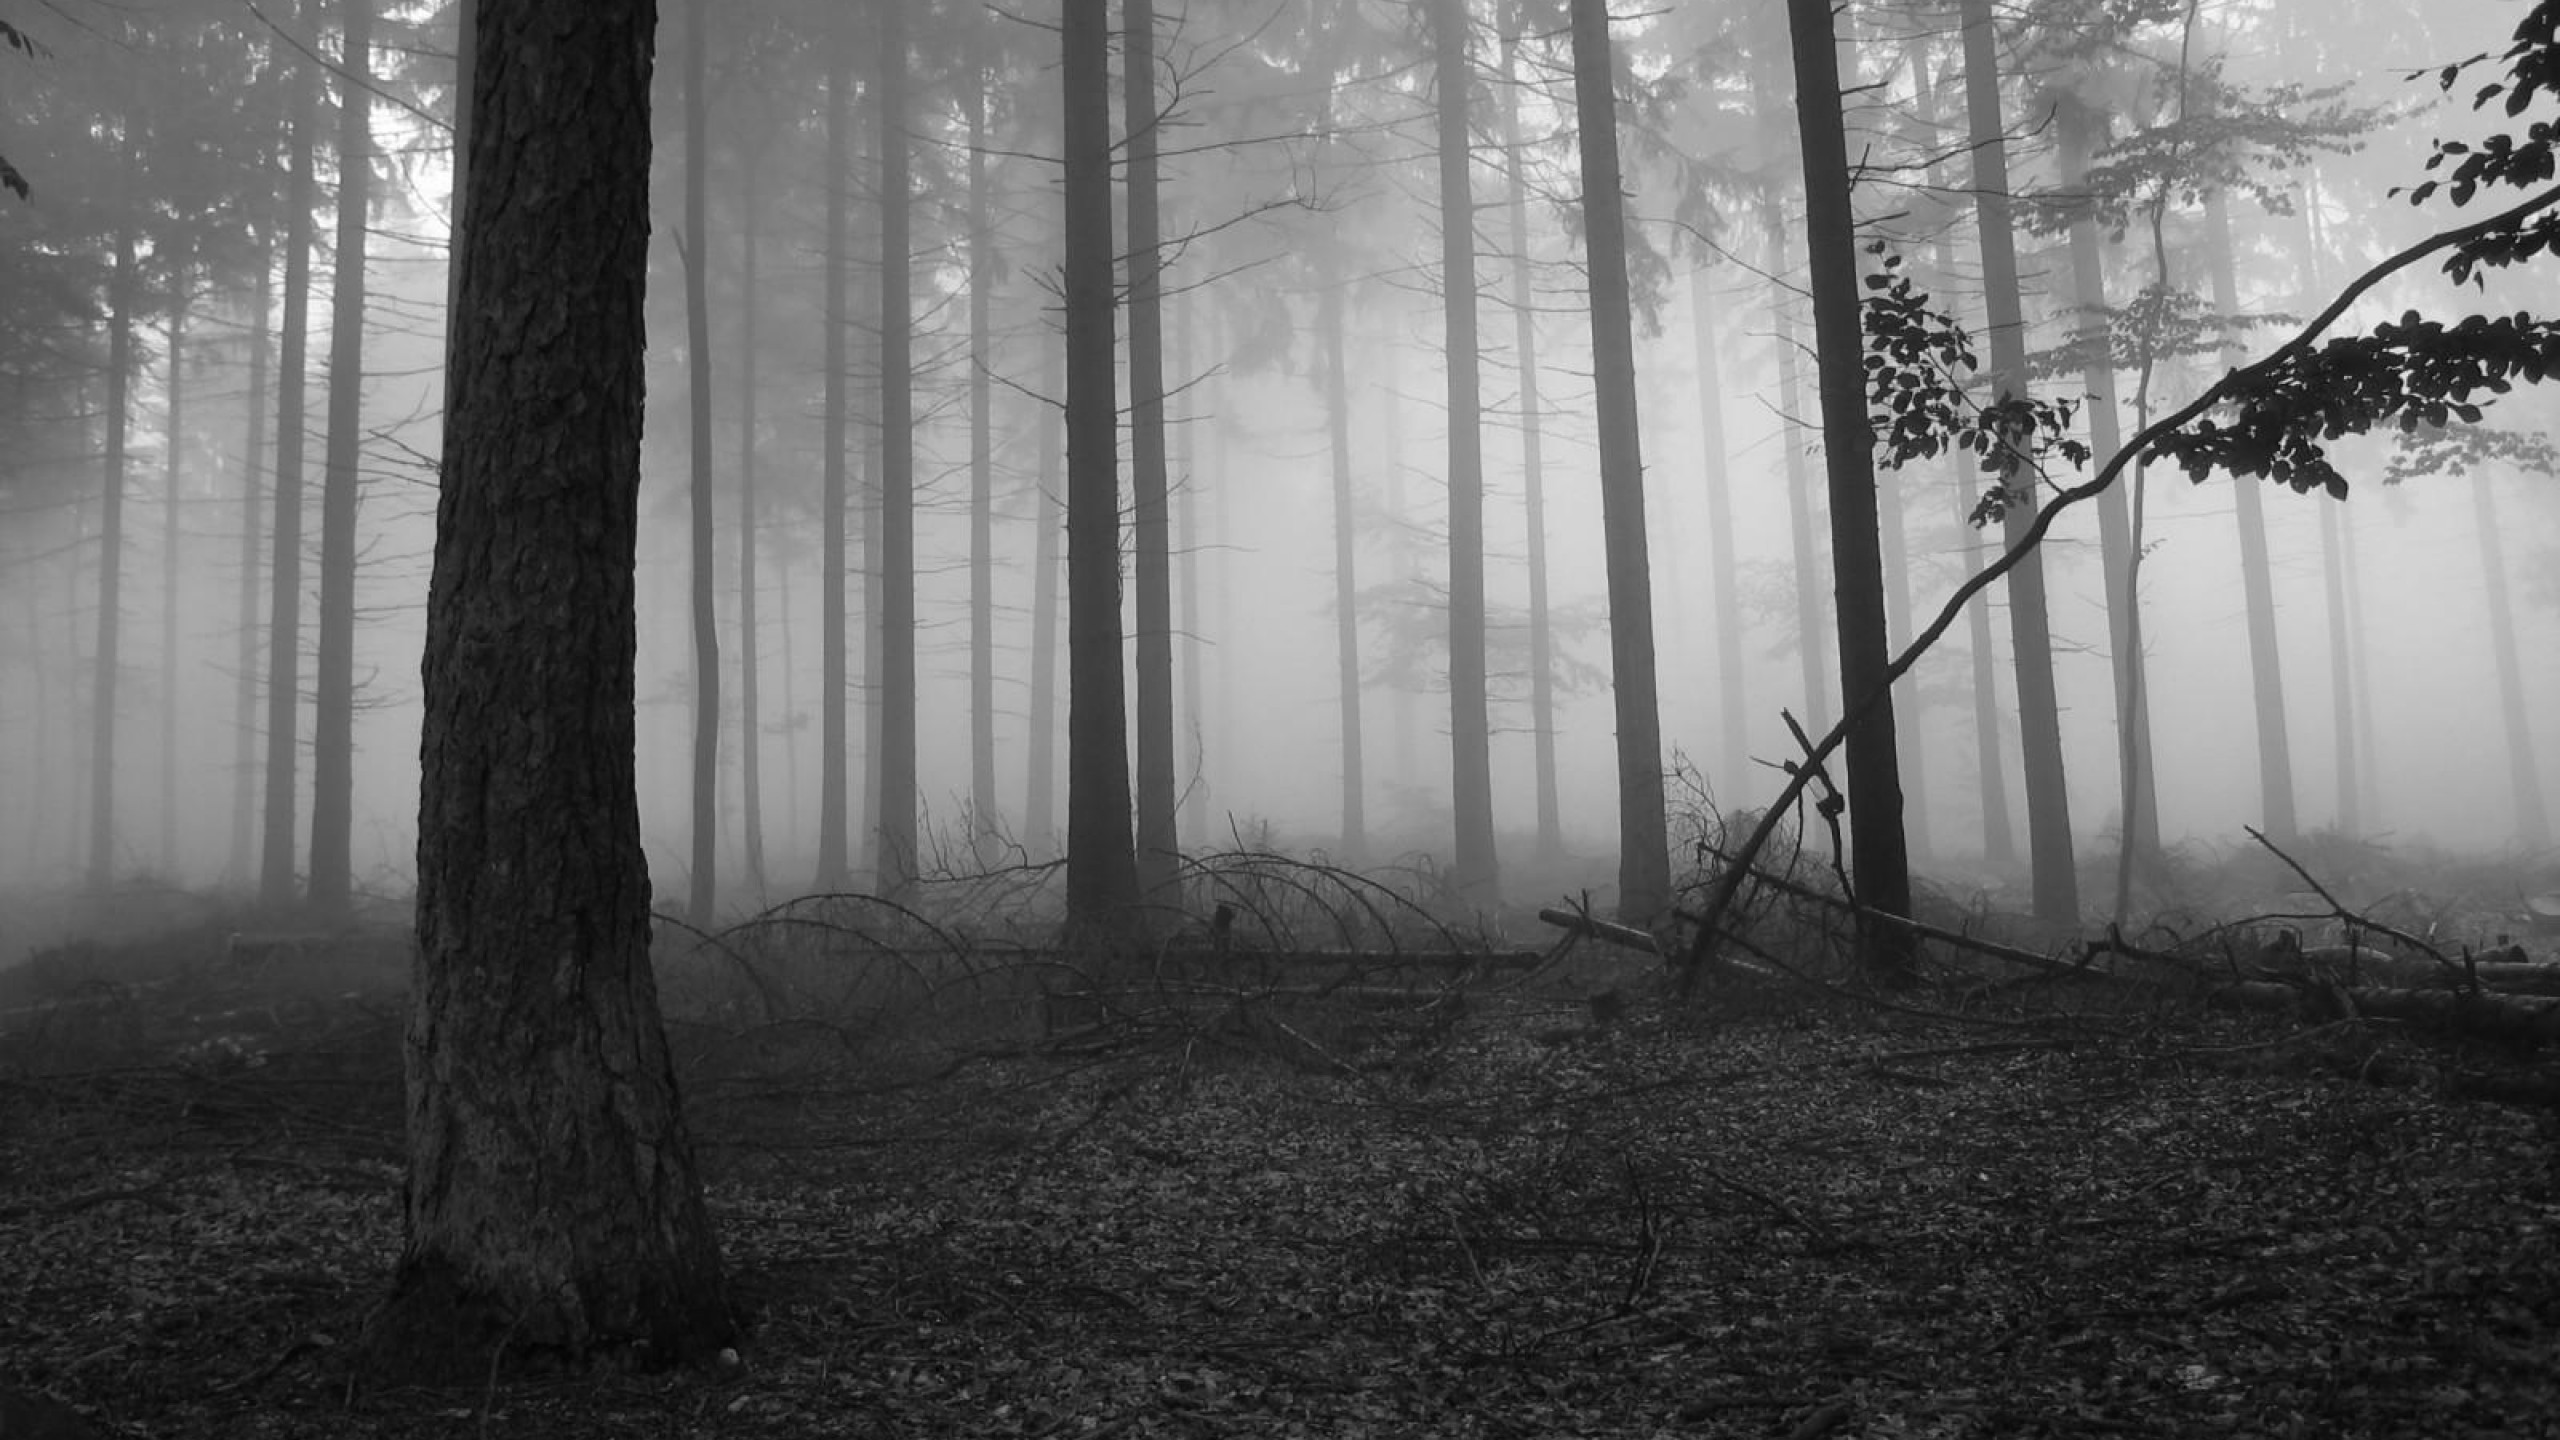 Fog in the dark forest Nature HD desktop wallpaper, Tree wallpaper, Forest  wallpaper, Fog wallpaper, Branch wallpaper – Nature no.